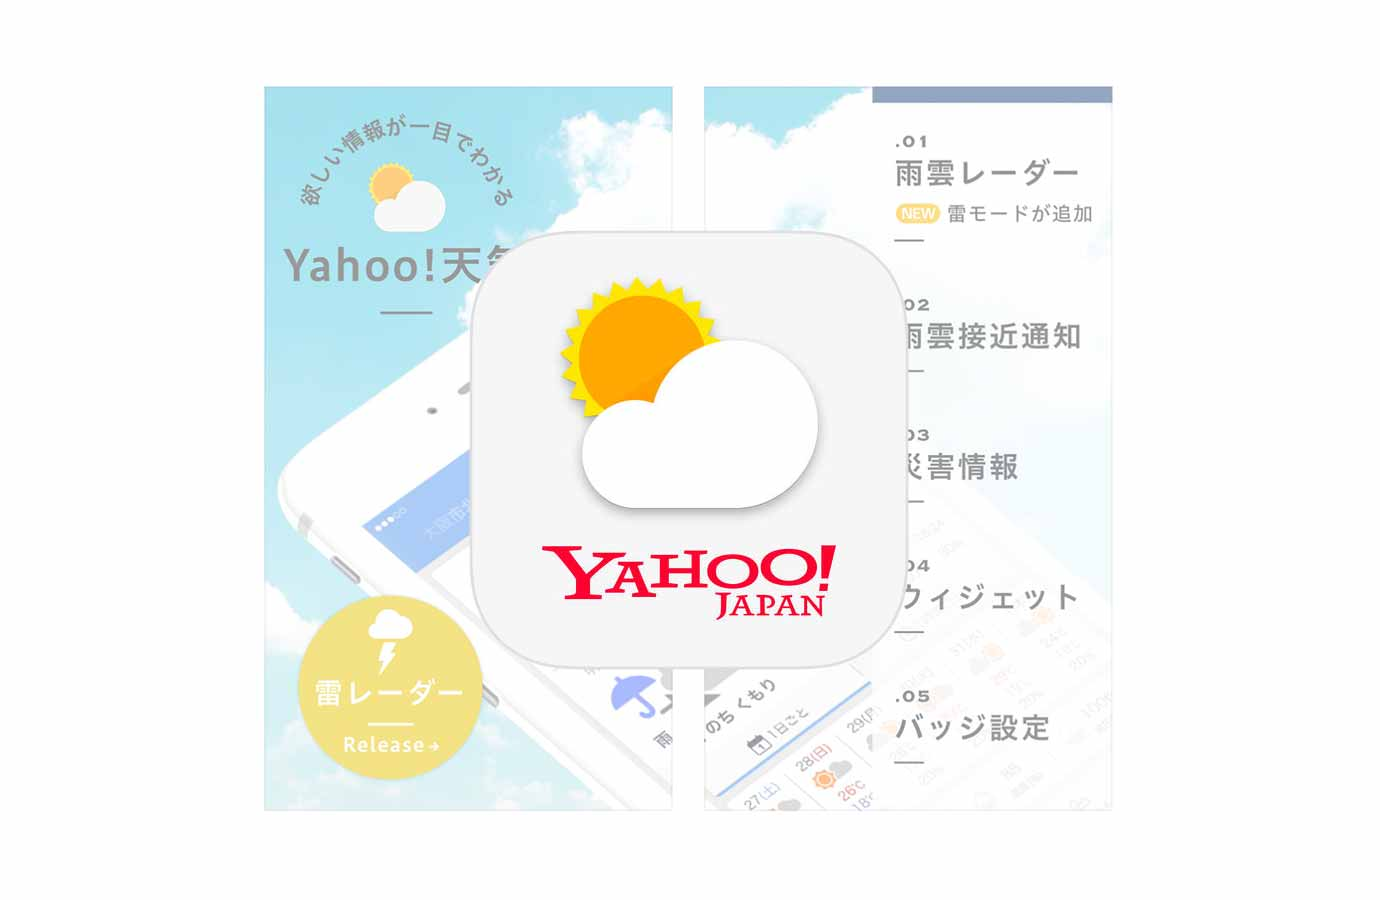 Yahoo Japan、雨雲レーダーに雷モードを追加したiOSアプリ「Yahoo!天気 6.2.3」リリース